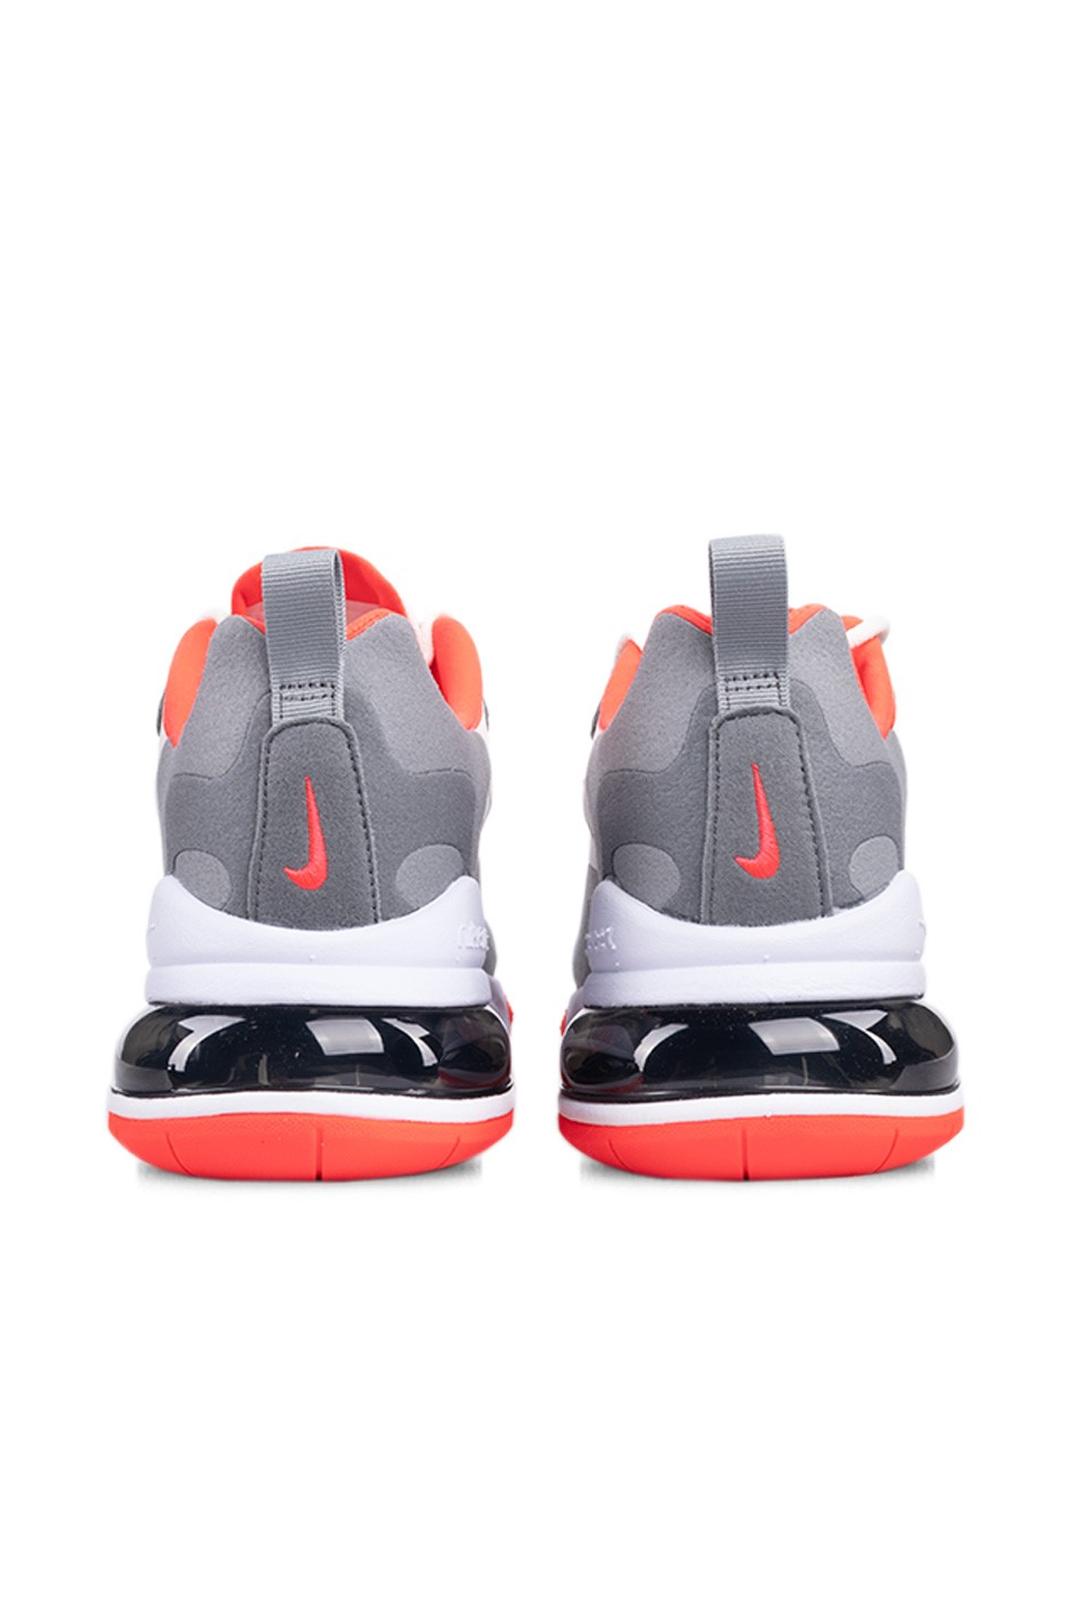 Baskets / Sport  Nike CT1264 100 100 BLANC/GRIS/BLANC